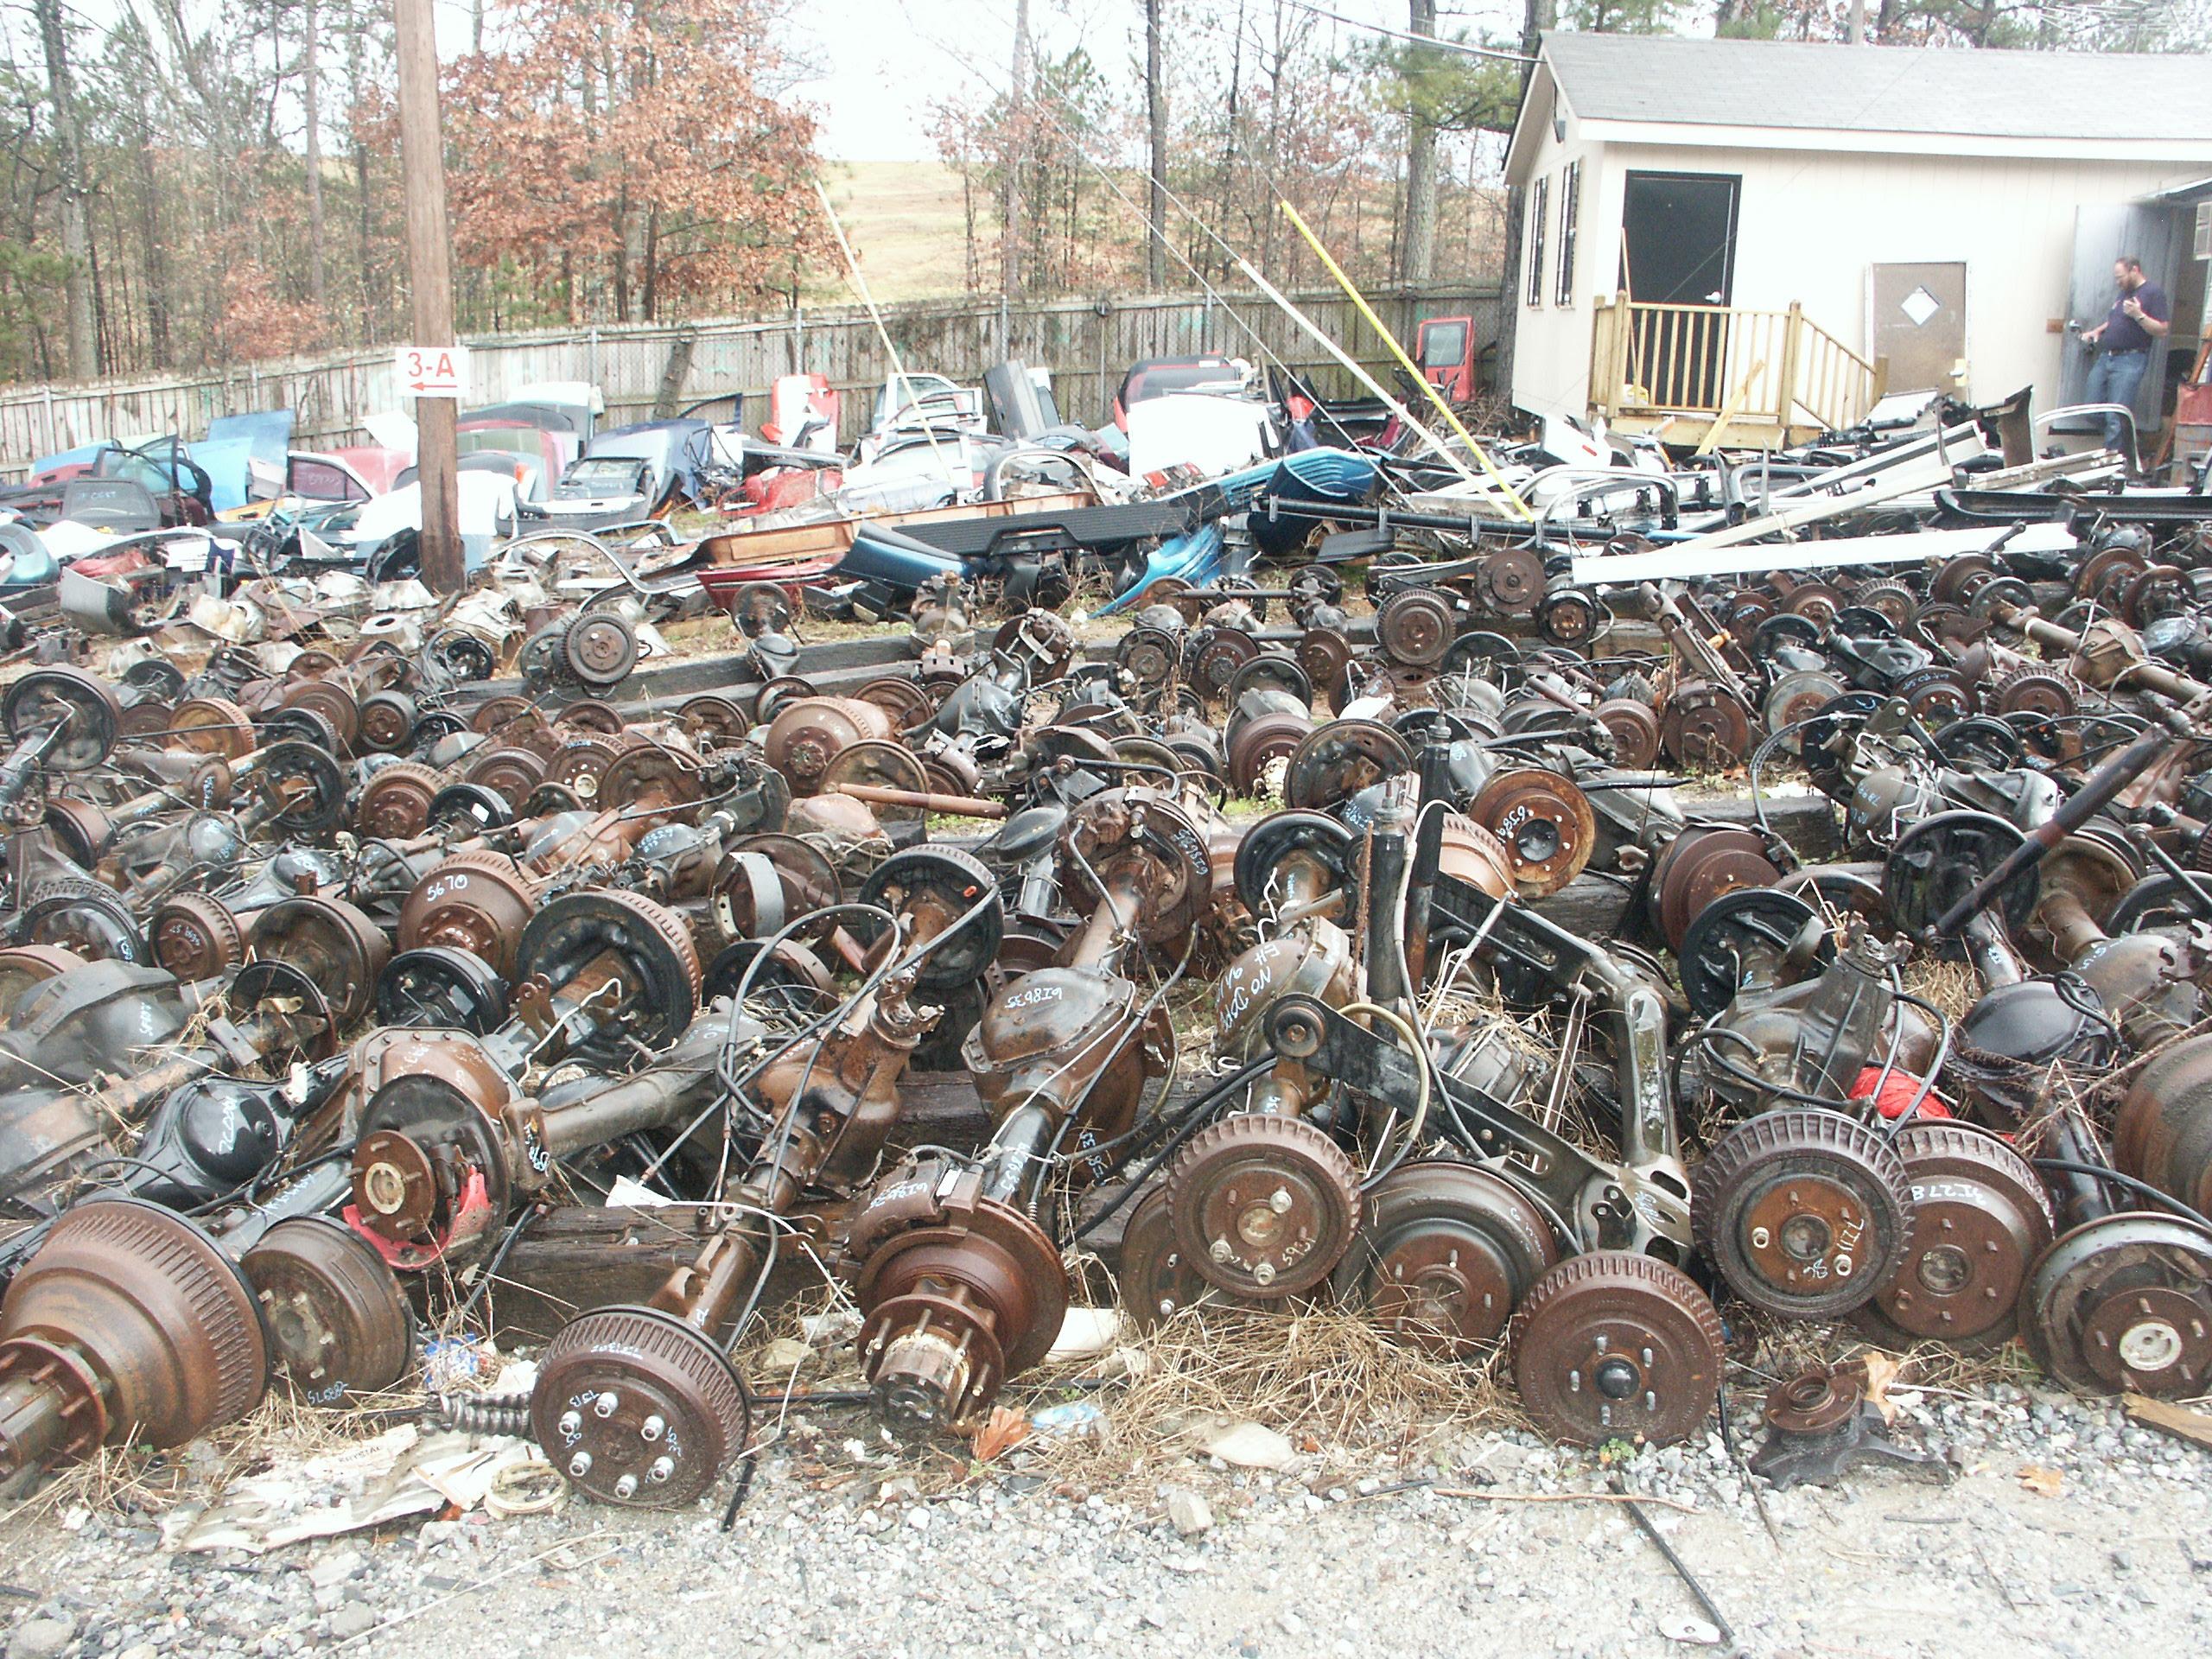 Mop Auto Parts Junkyard Pick A Junkyard Online Directory | Used Car ...